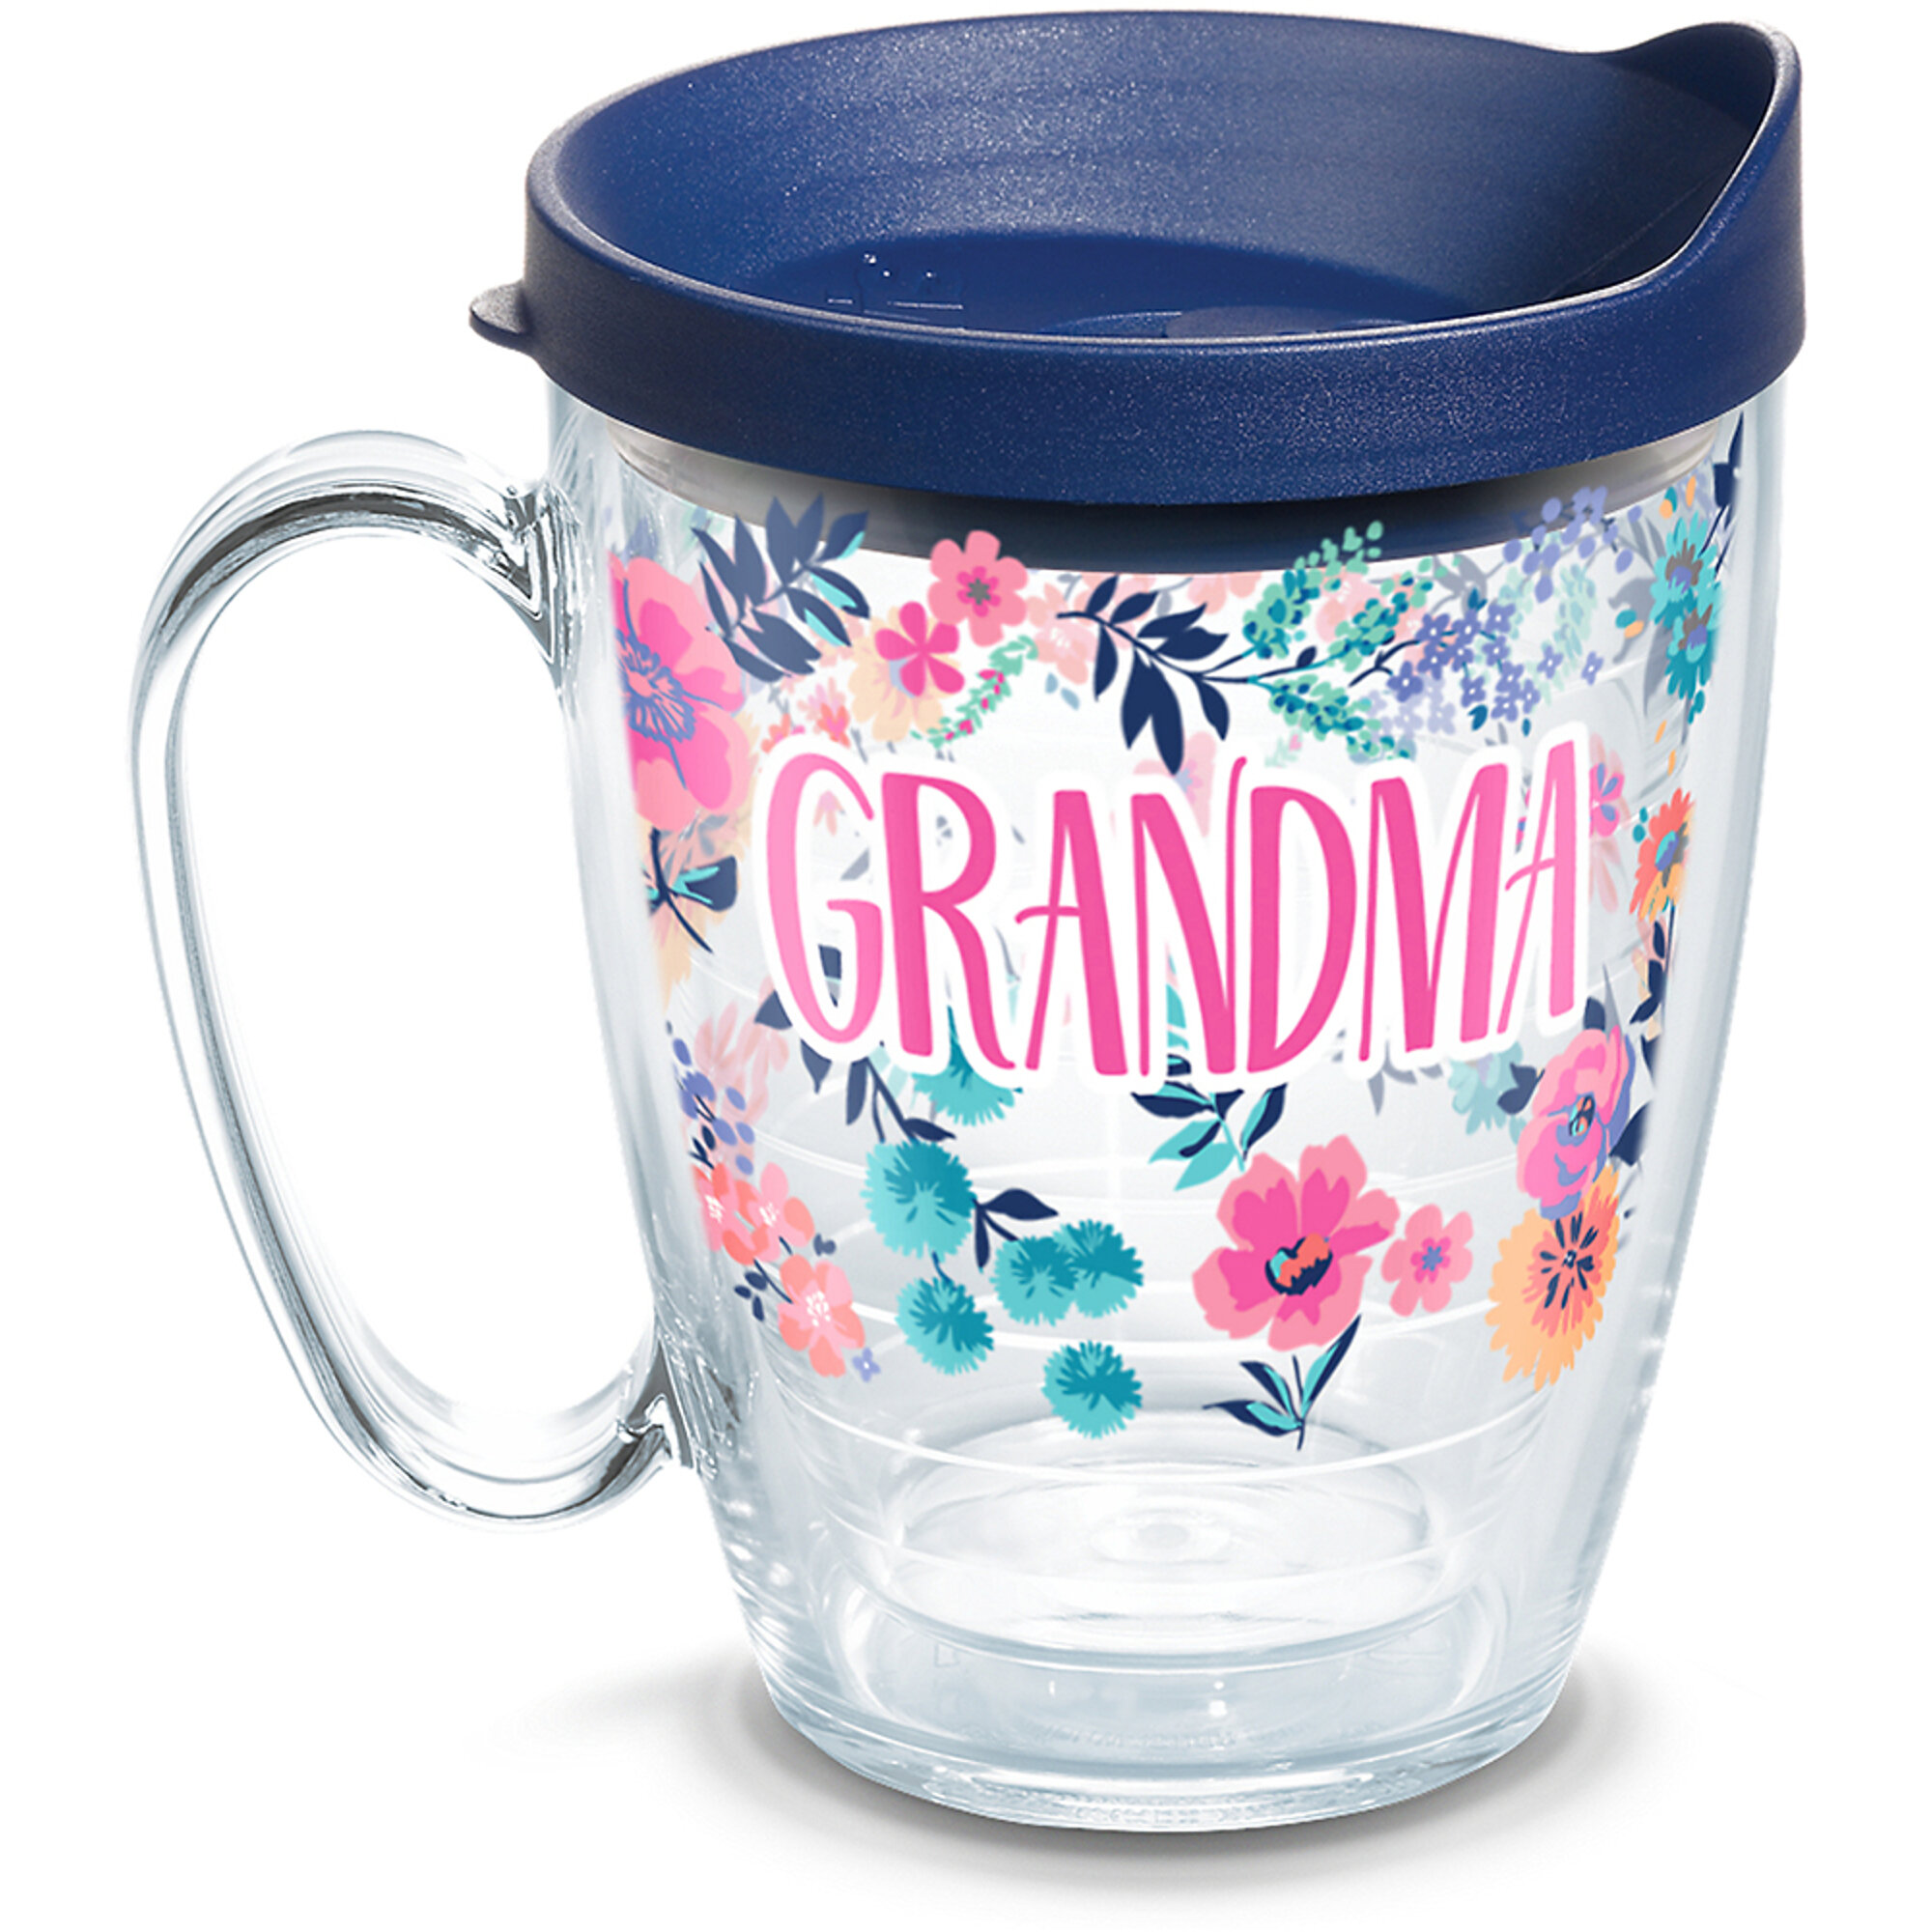 Tervis Tumbler Grandma Dainty Floral 16 Oz Travel Mug Wayfair